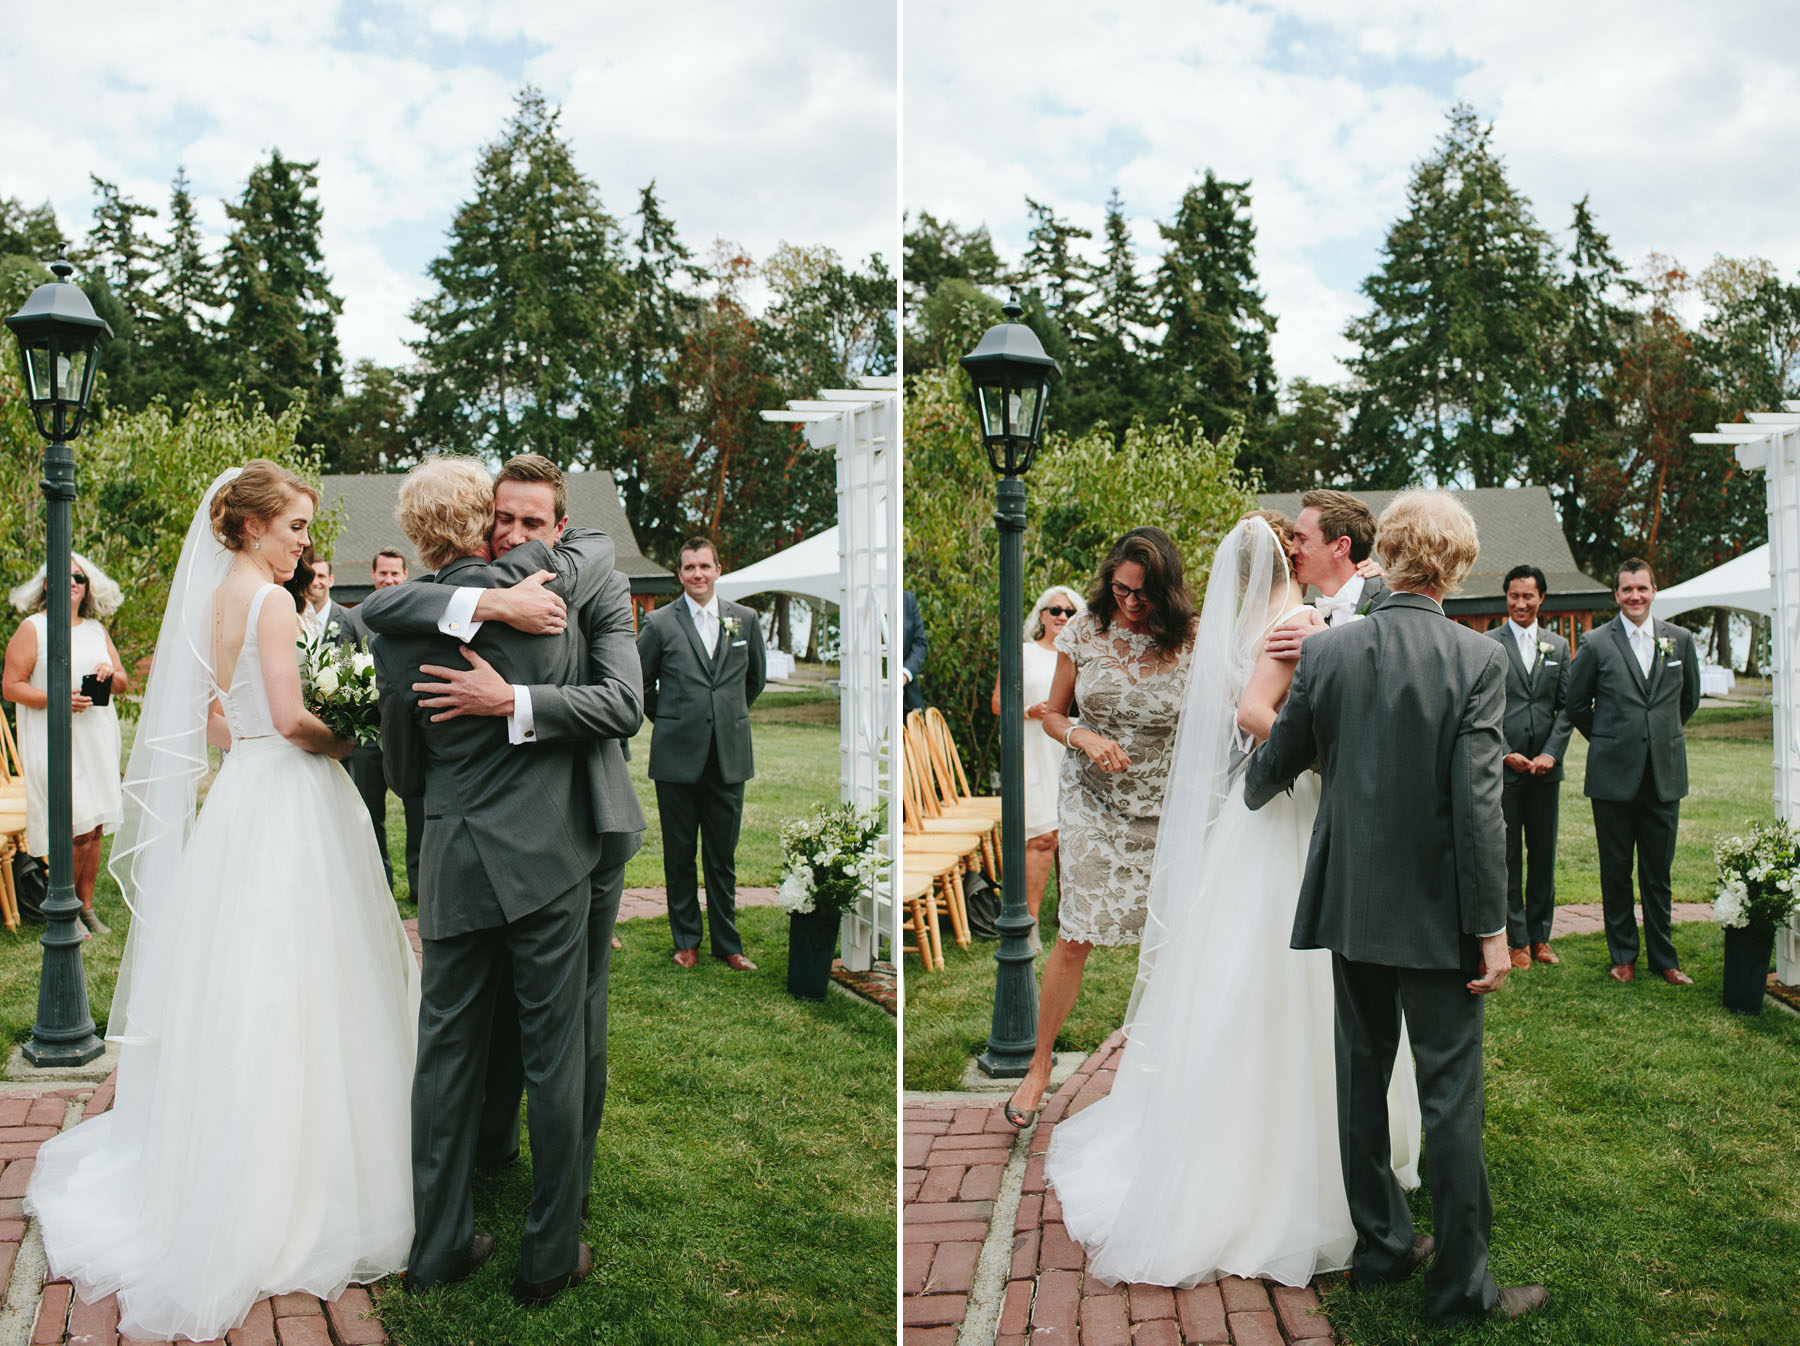 thetis-island-wedding-photographer-rp-rn-076.jpg